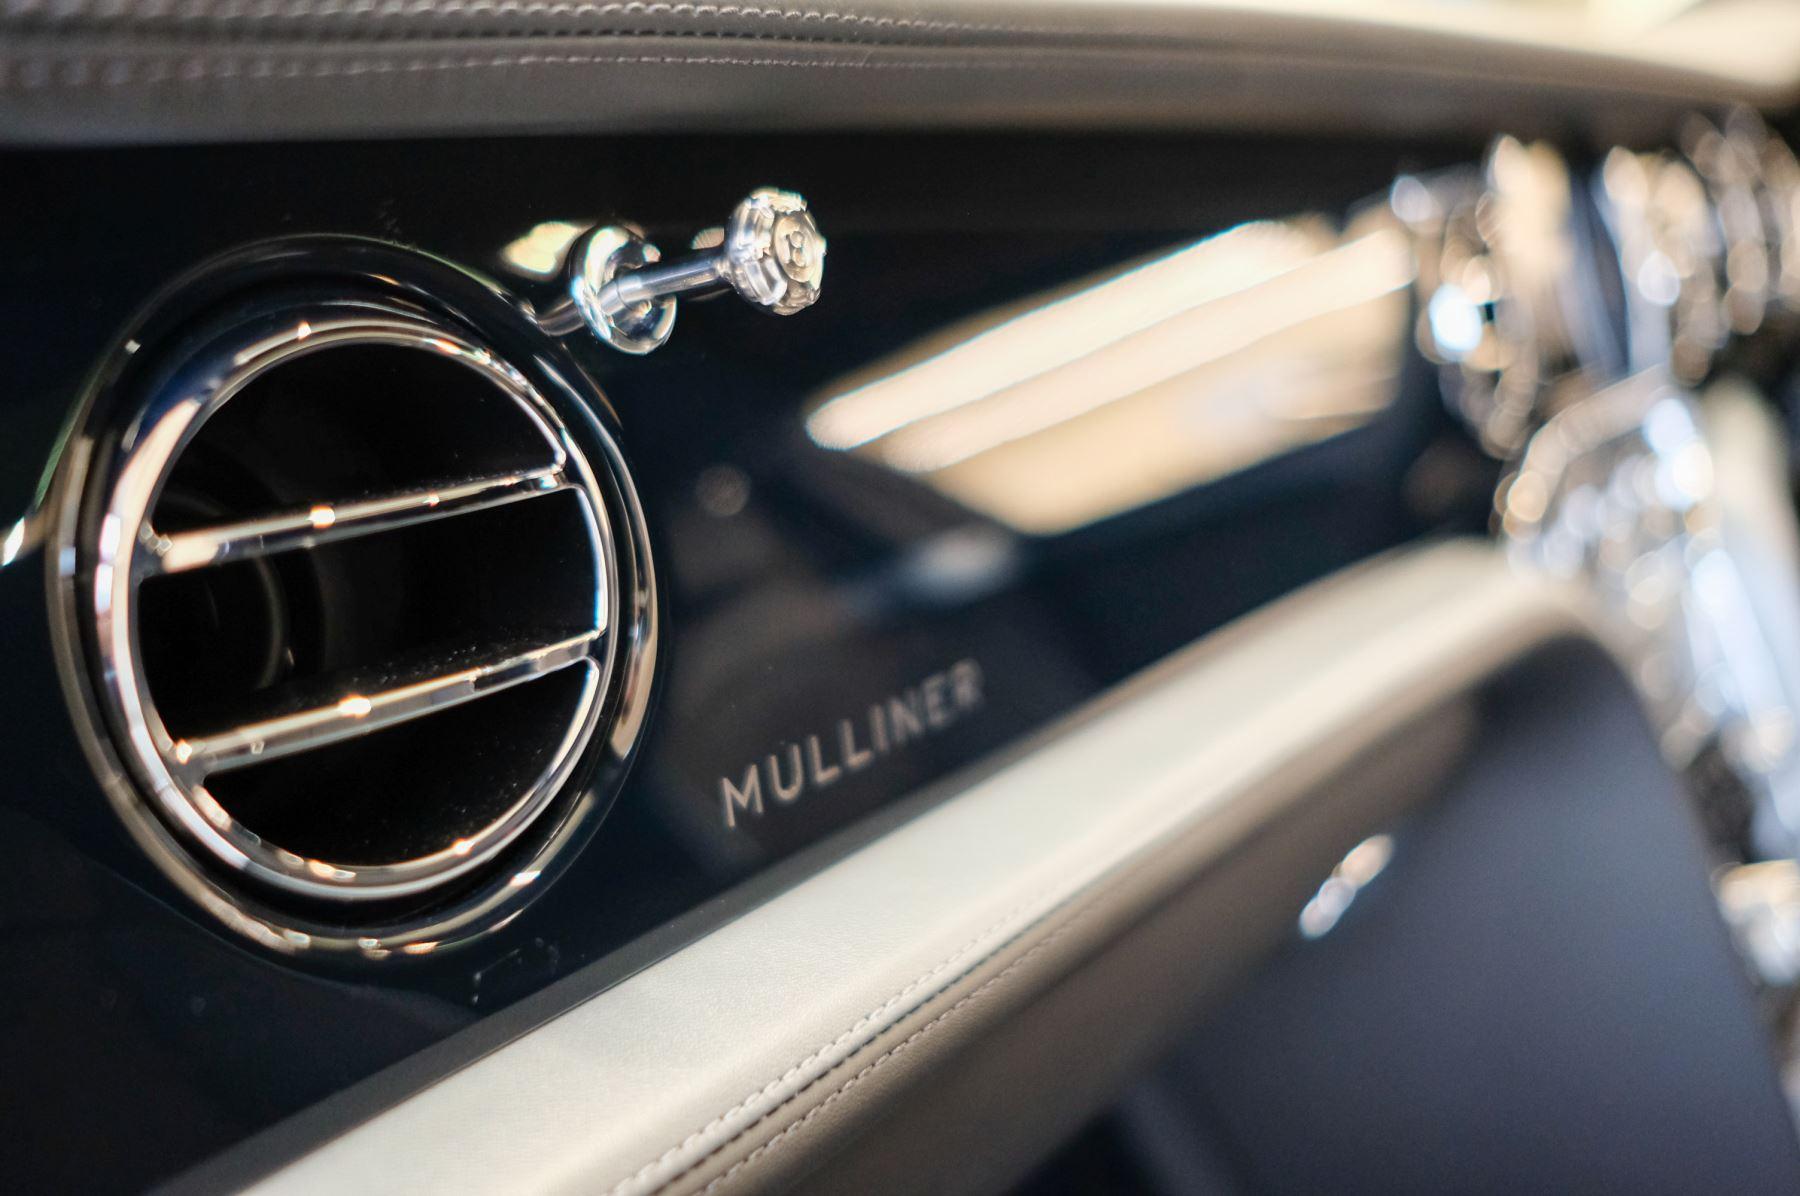 Bentley Mulsanne Mulsanne 6.75 Edition by Mulliner image 24